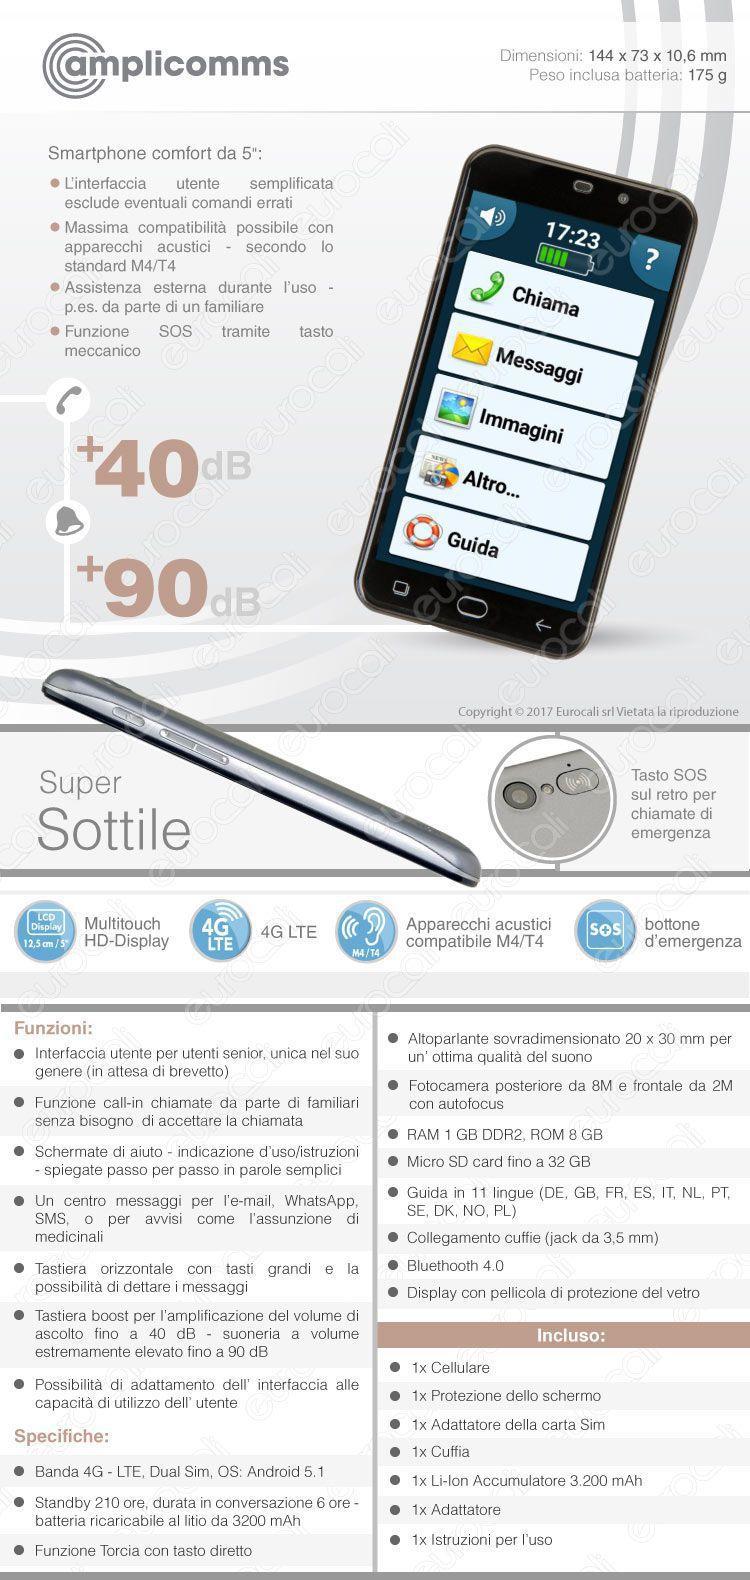 Amplicomms Smartphone M9500